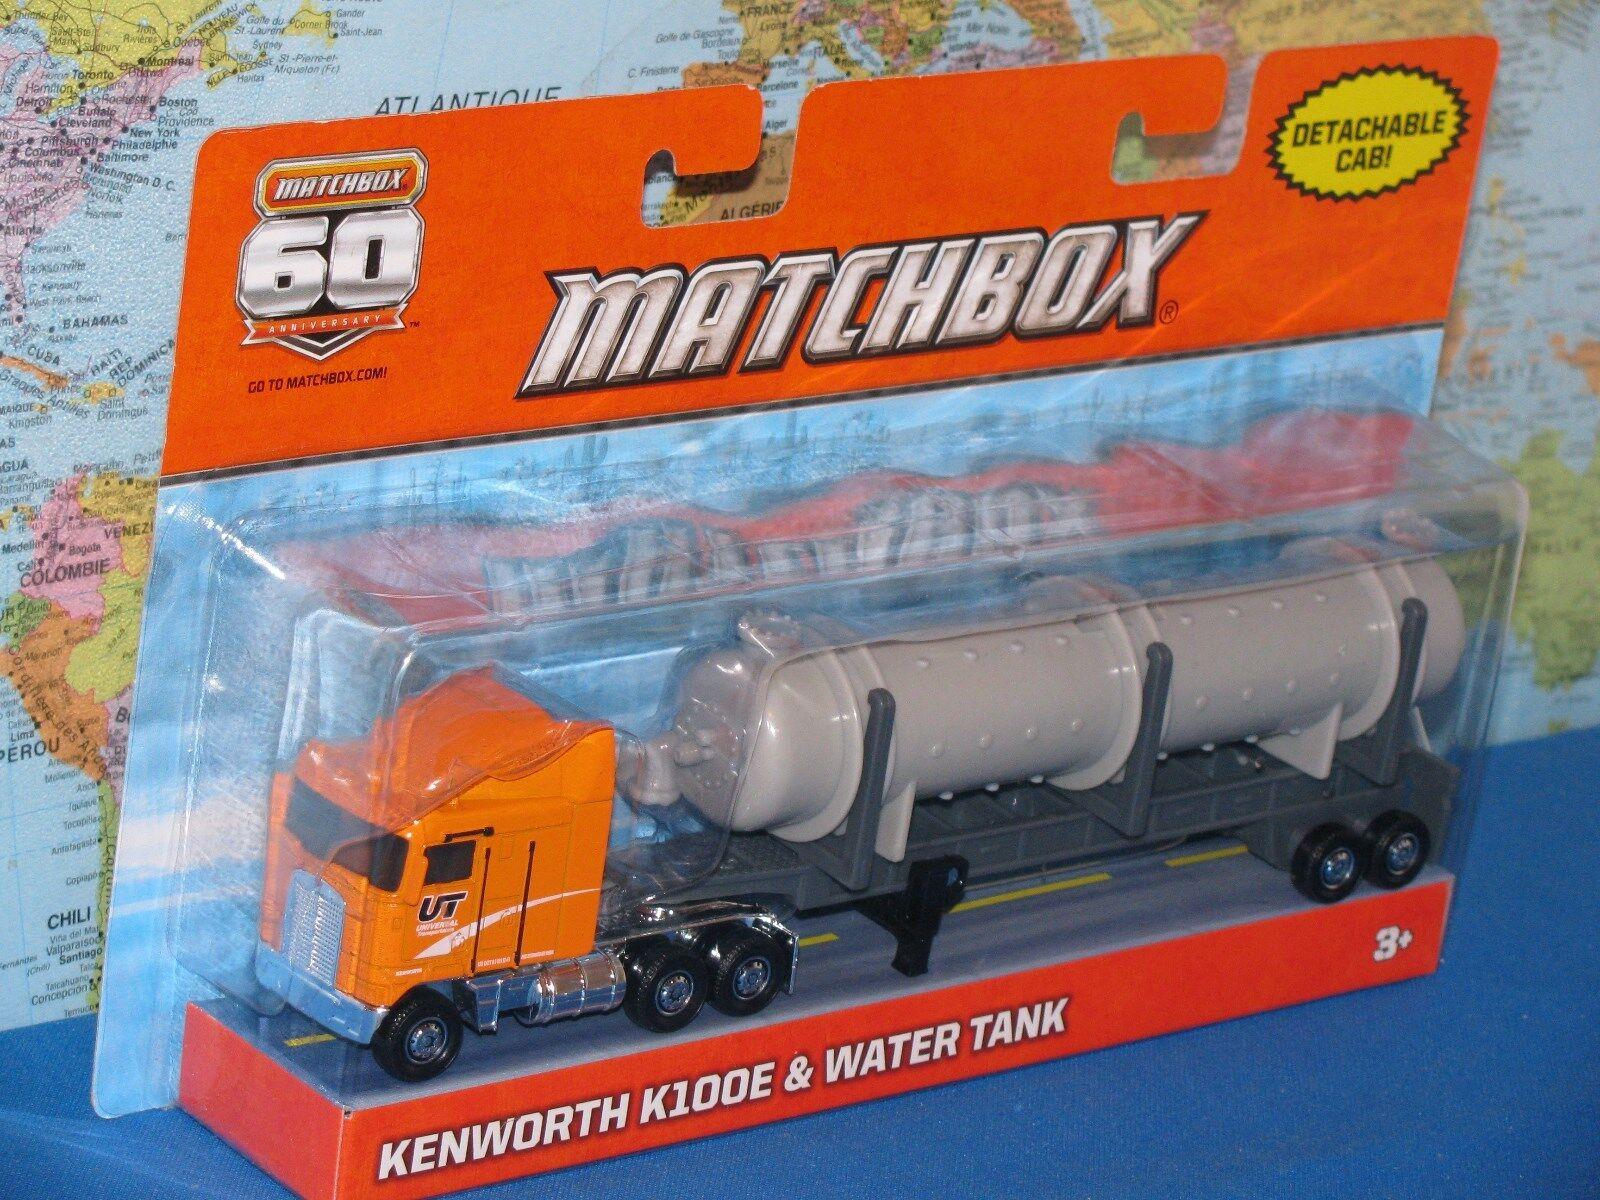 MATCHBOX KENWORTH K100E & WATER TANK 60th ANNIVERSARY DETACHABLE CAB 9  (23cm)